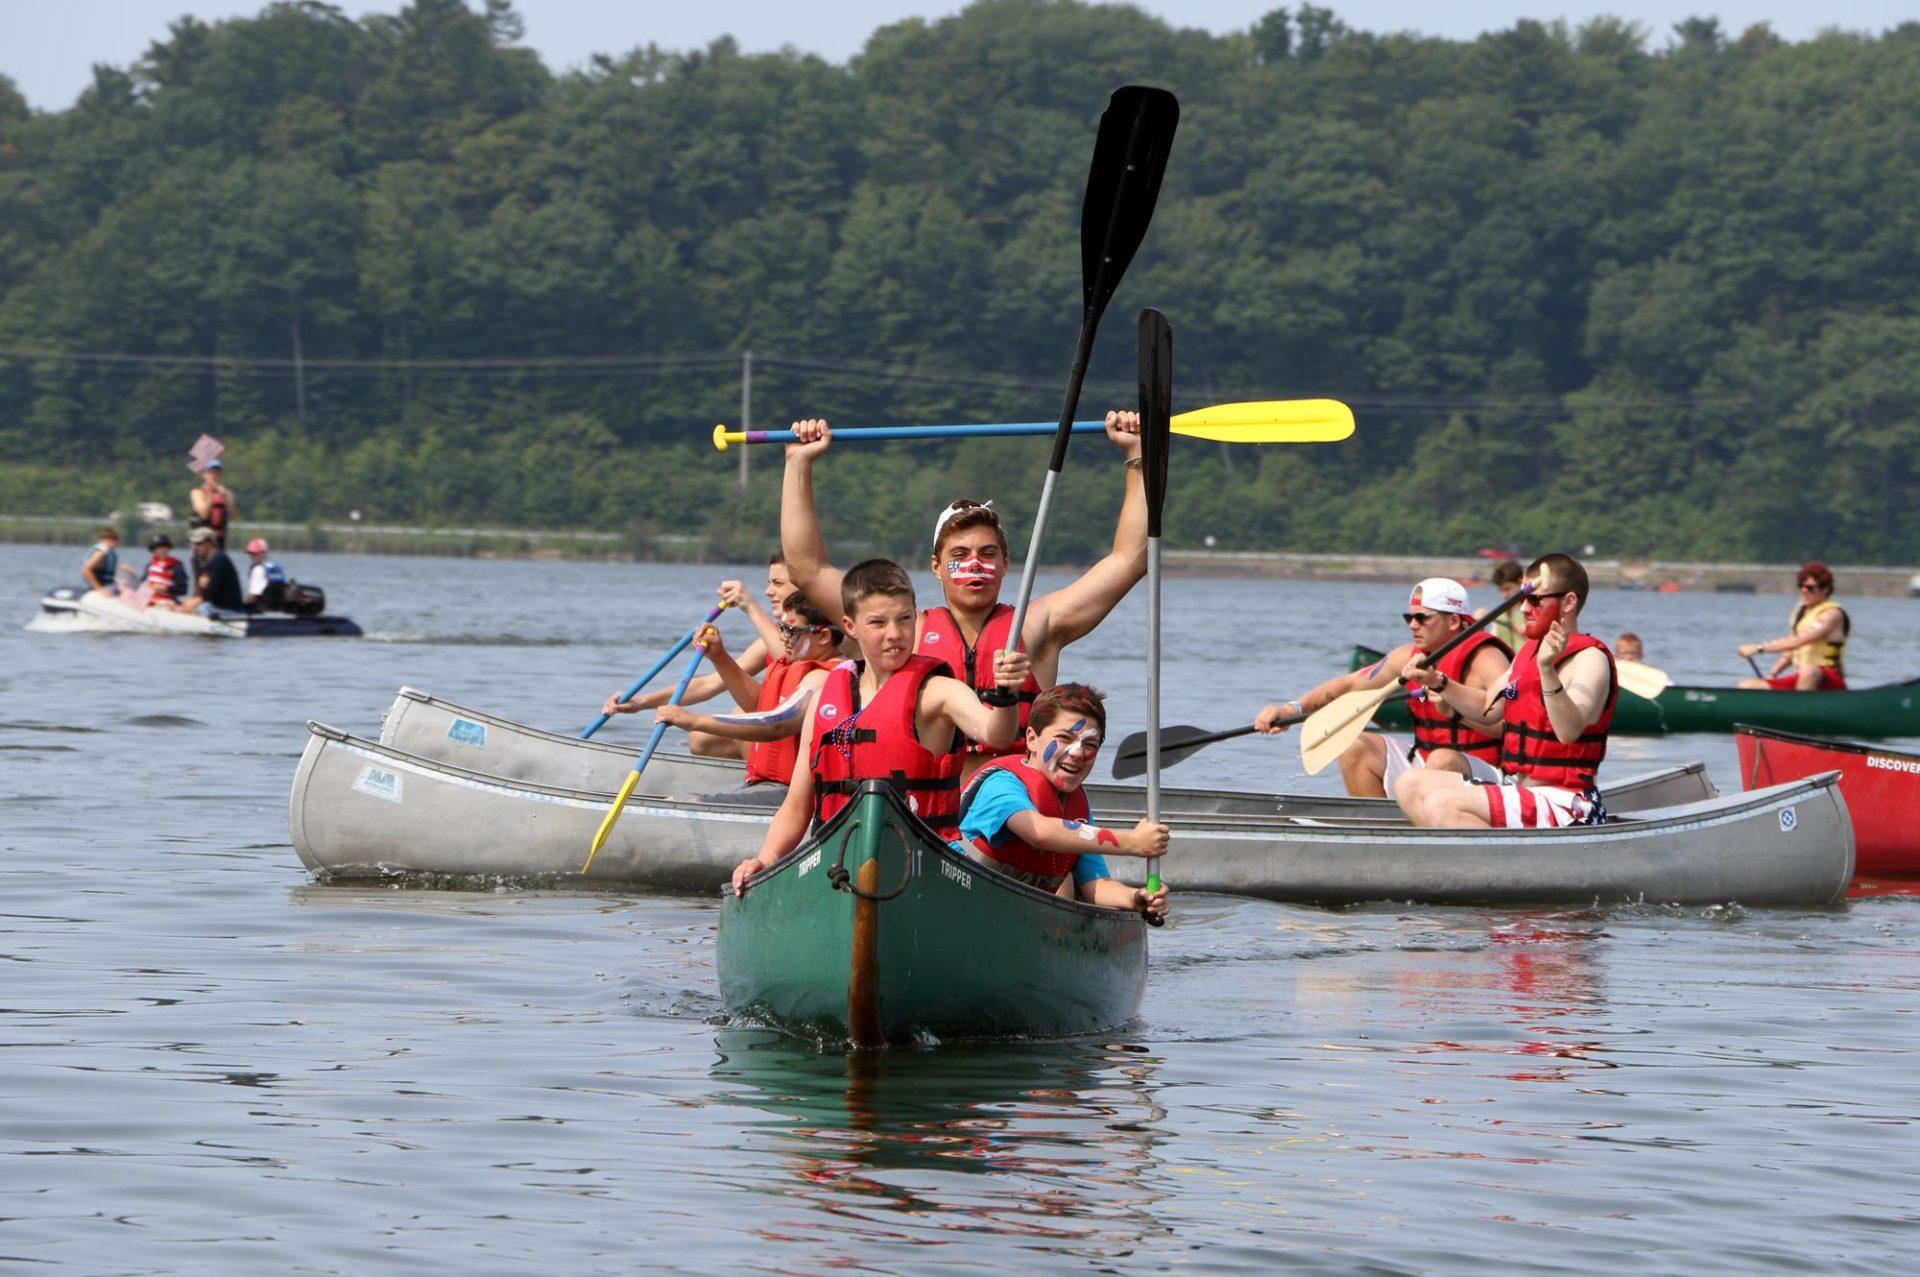 Camp Miniwanca Trailblazers in canoe wave paddles in celebration